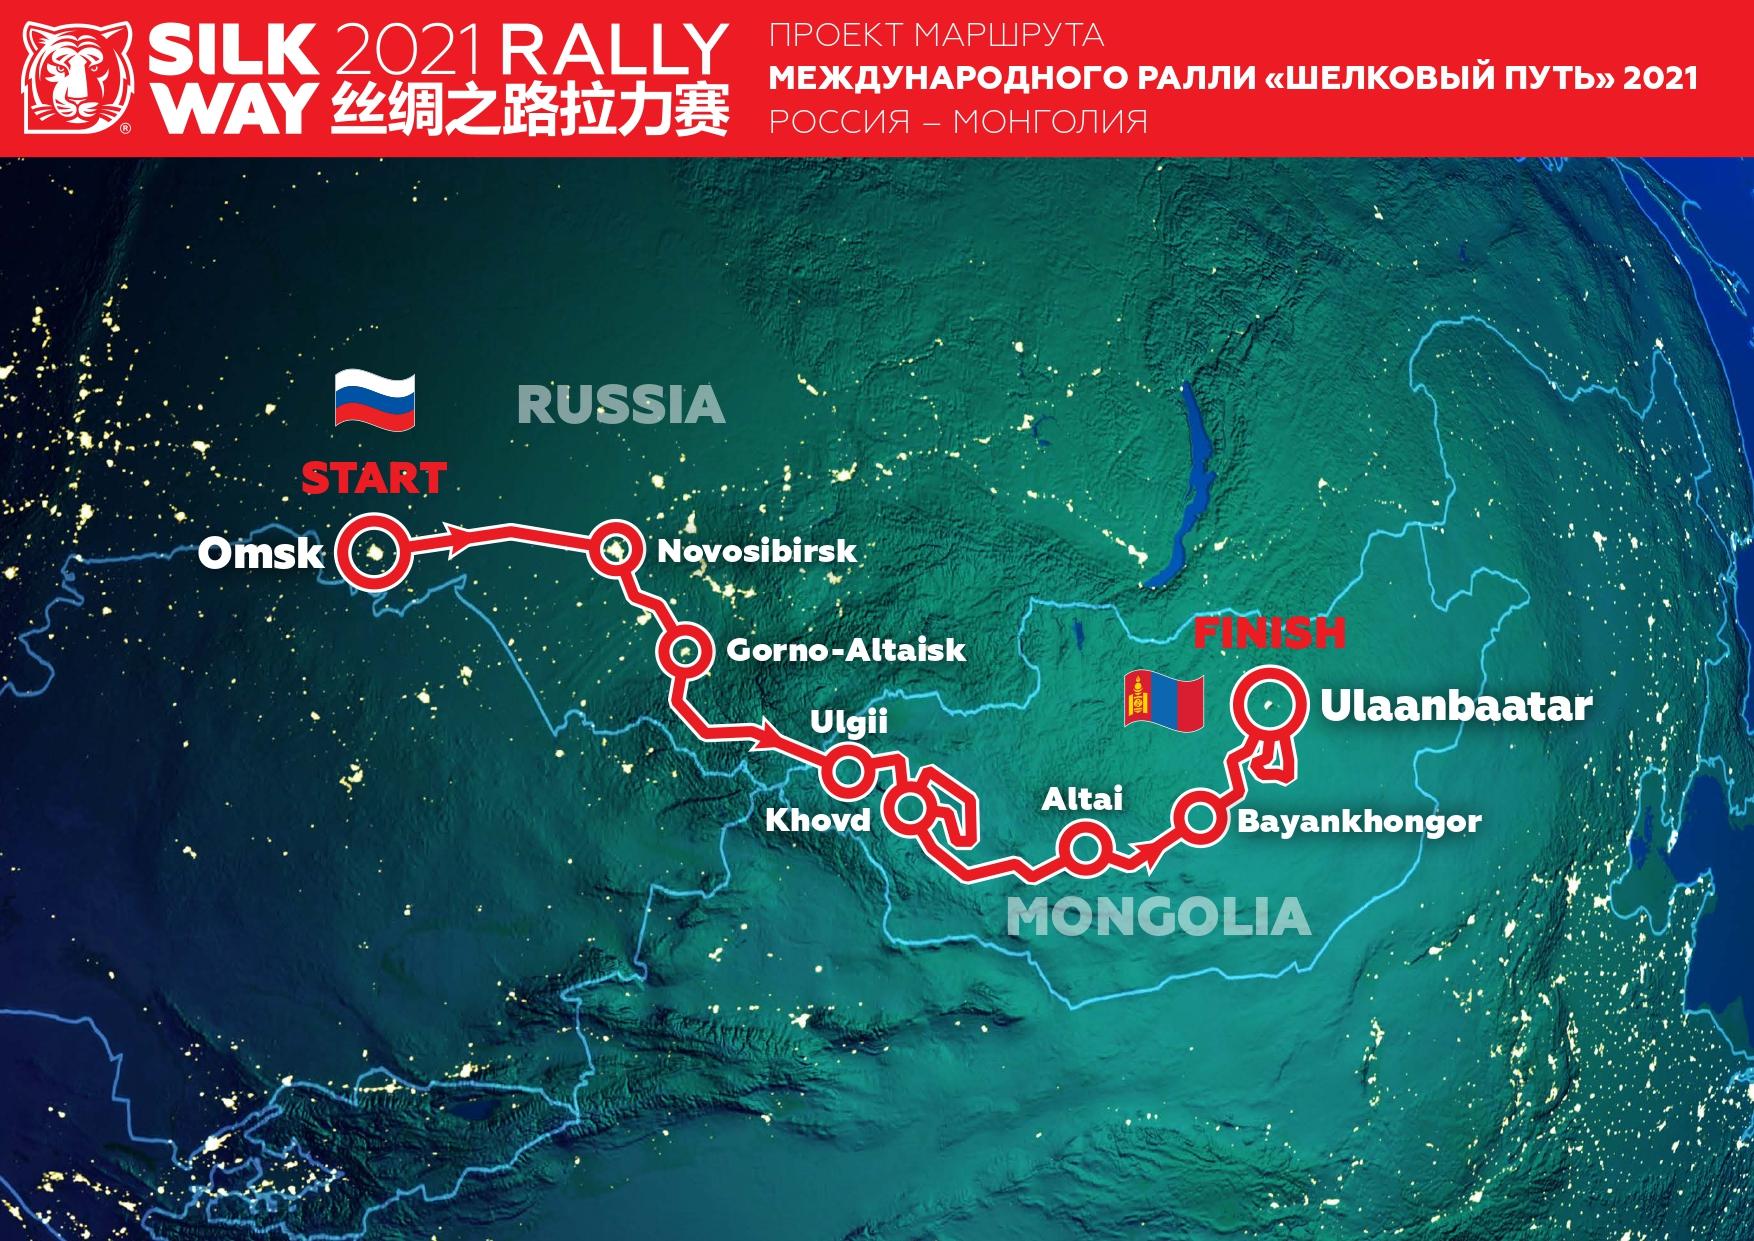 Объявлены экипажи команды «КАМАЗ-мастер» на ралли «Шёлковый путь-2021»